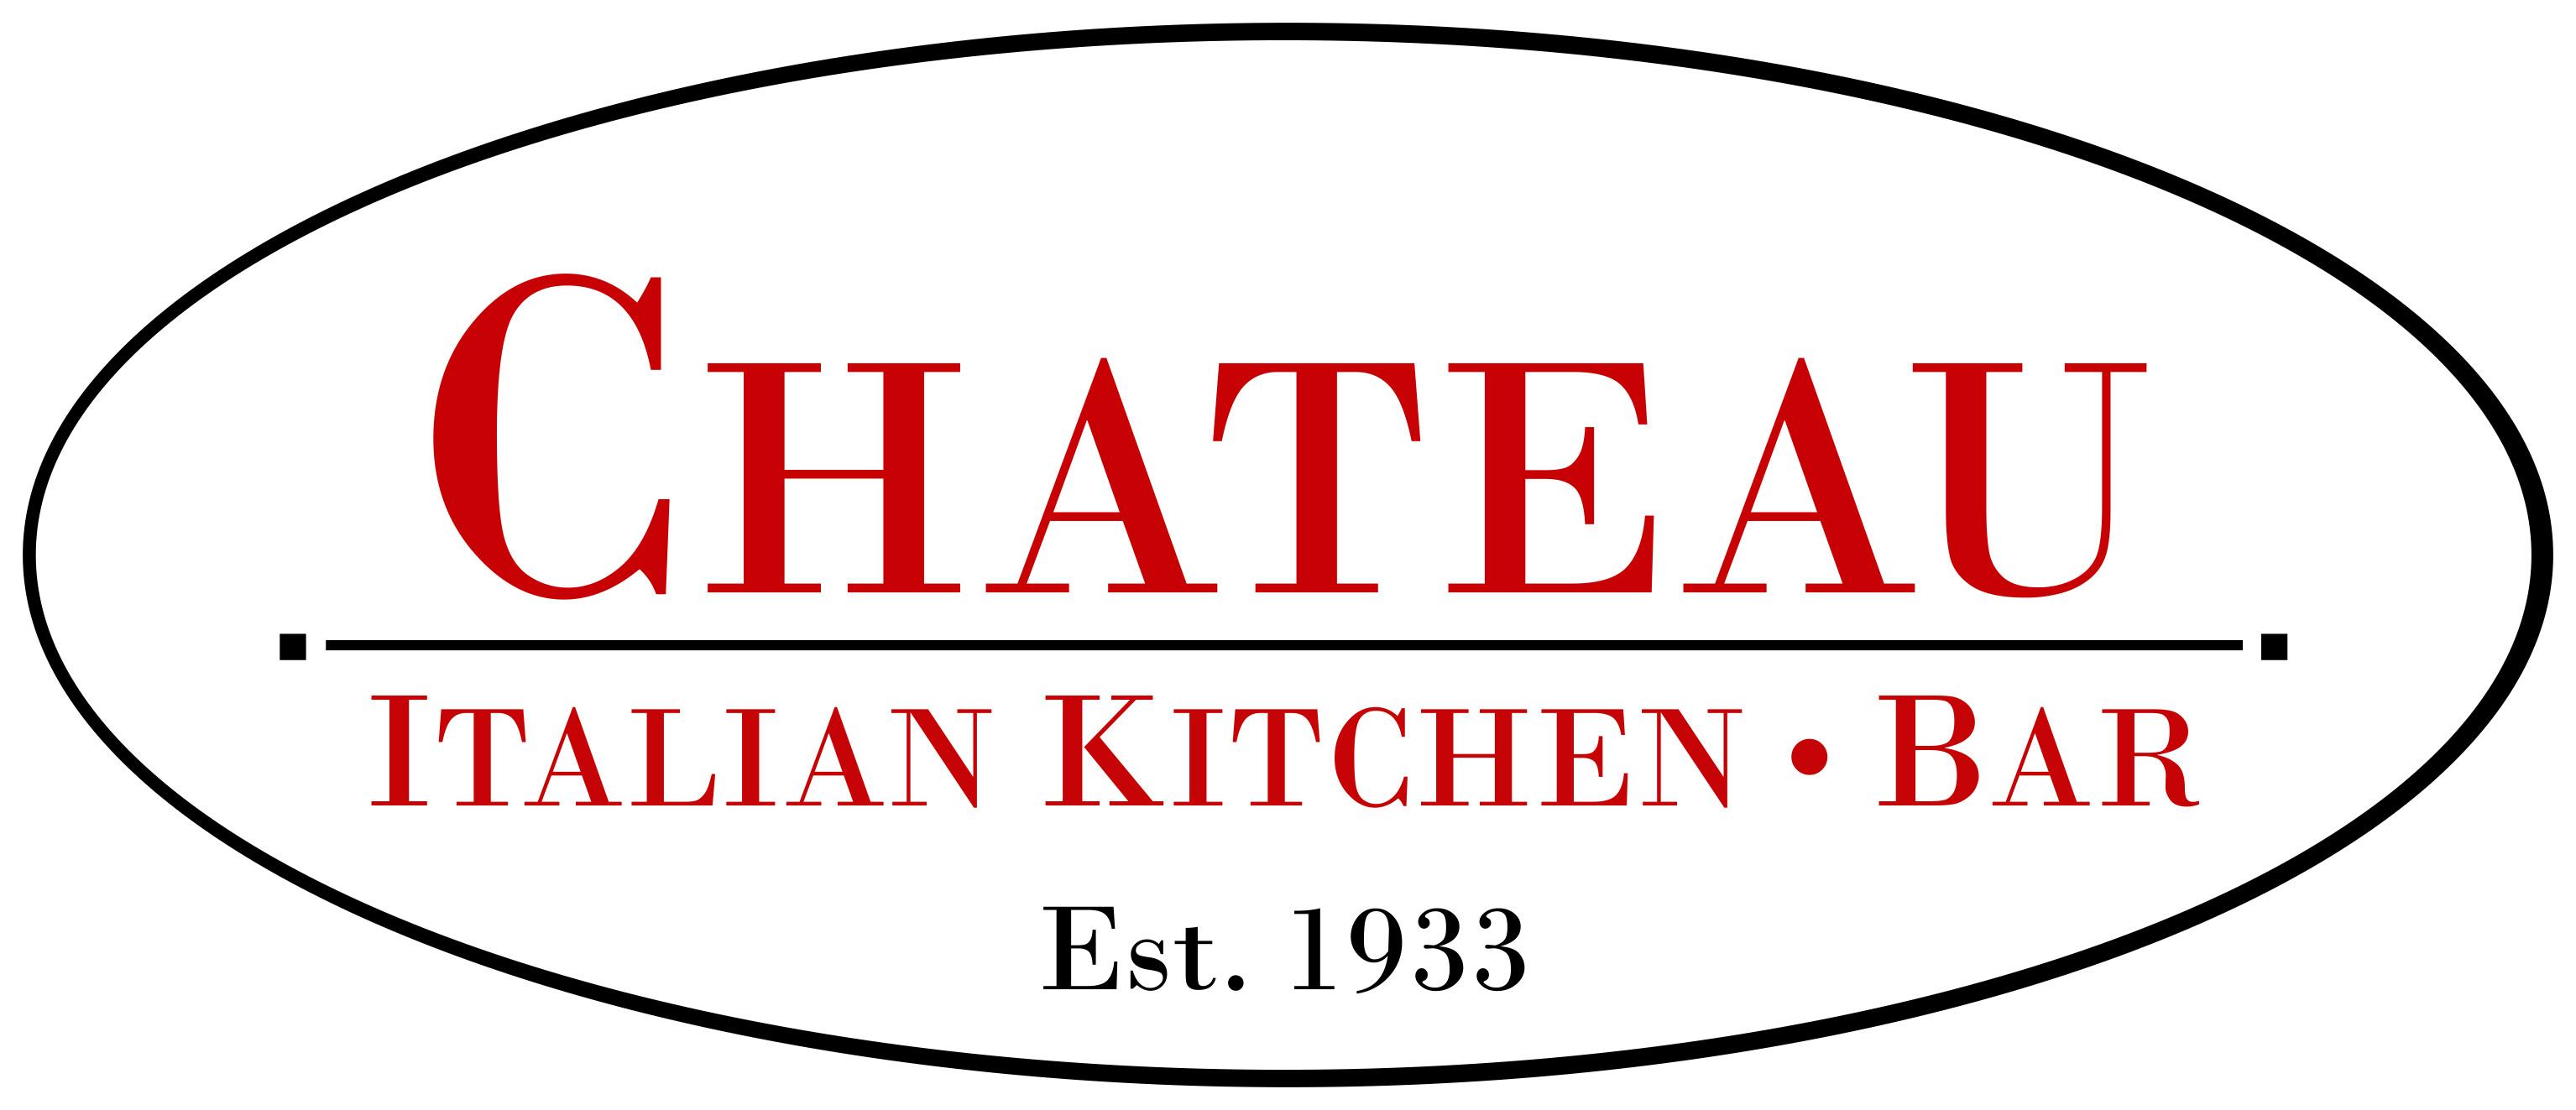 Chateau: Italian Kitchen and Bar